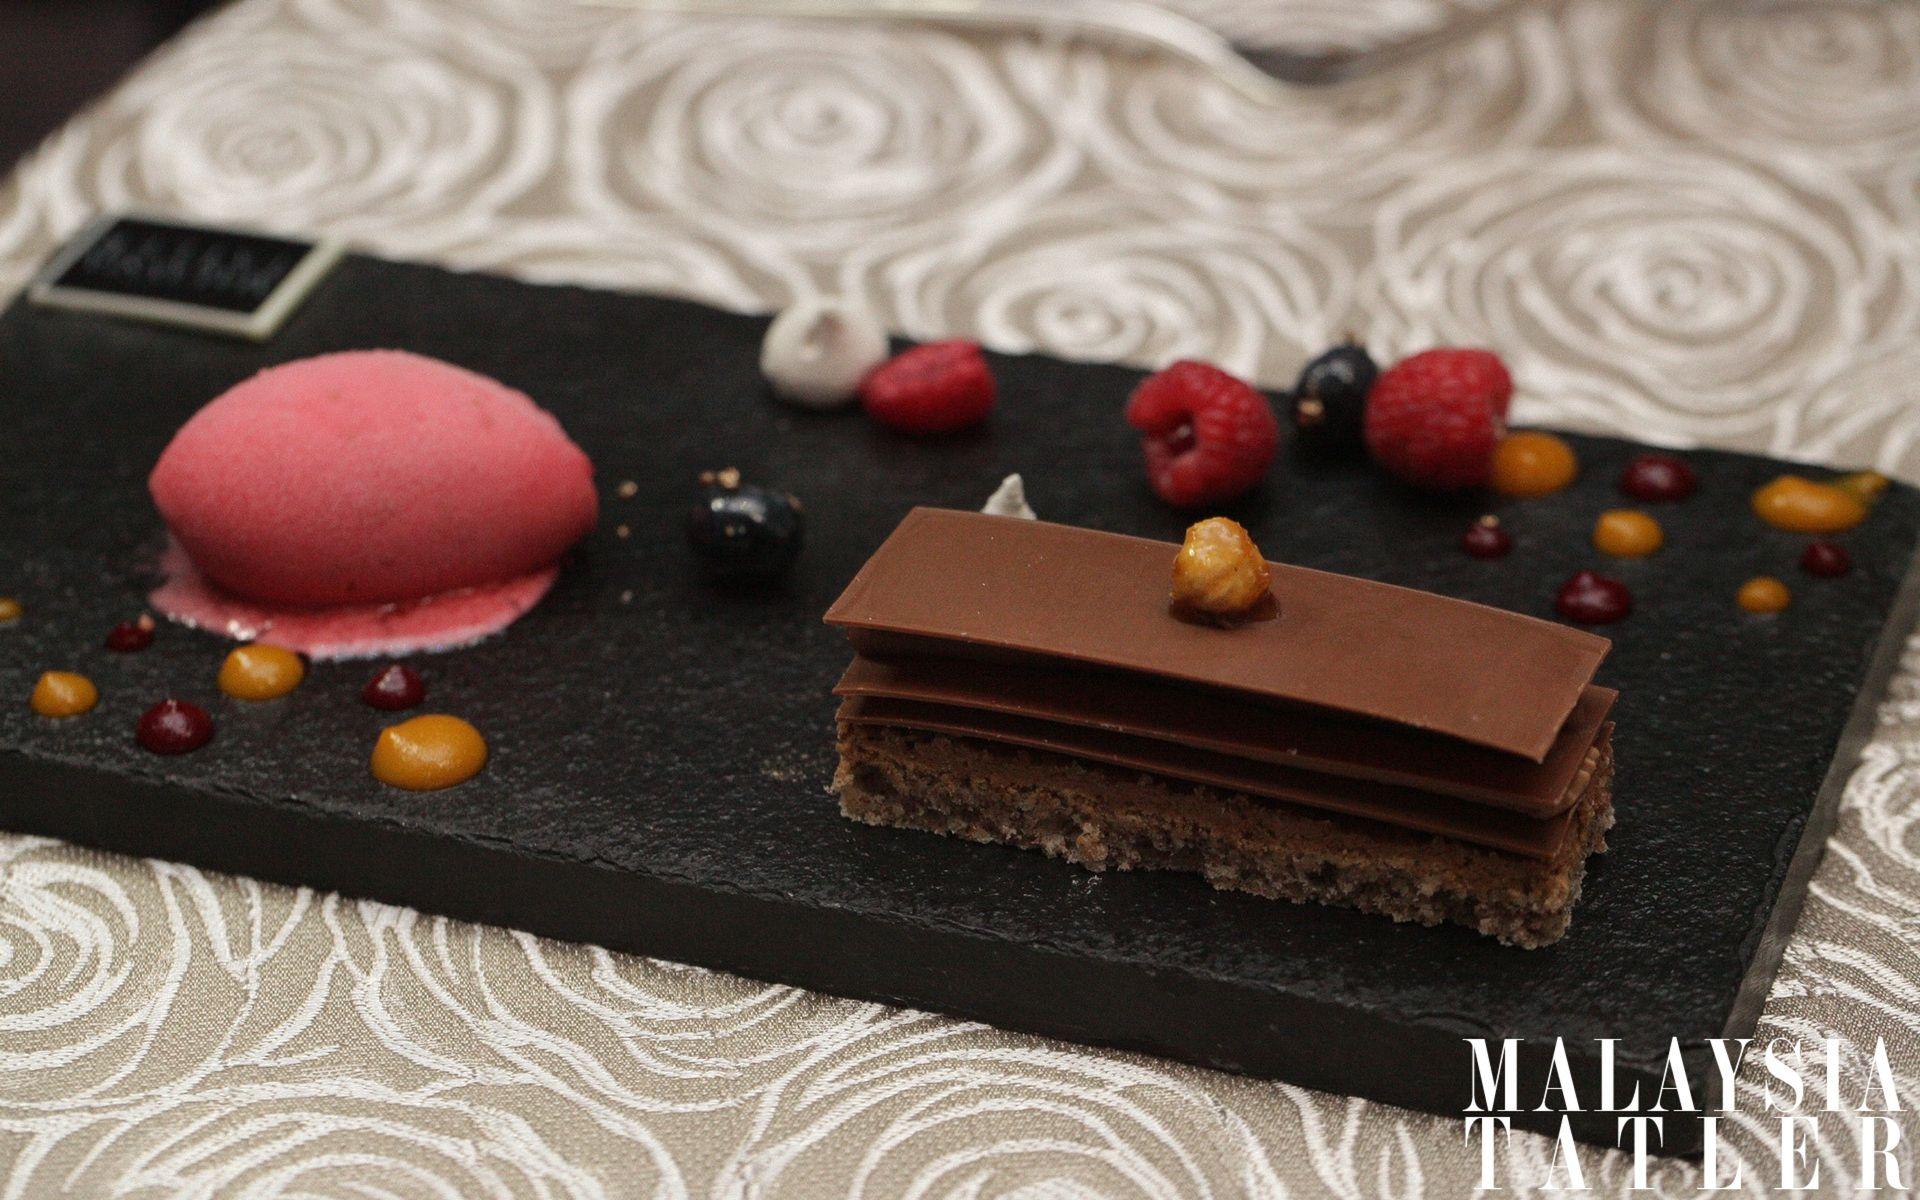 Chocolate and hazelnut dessert